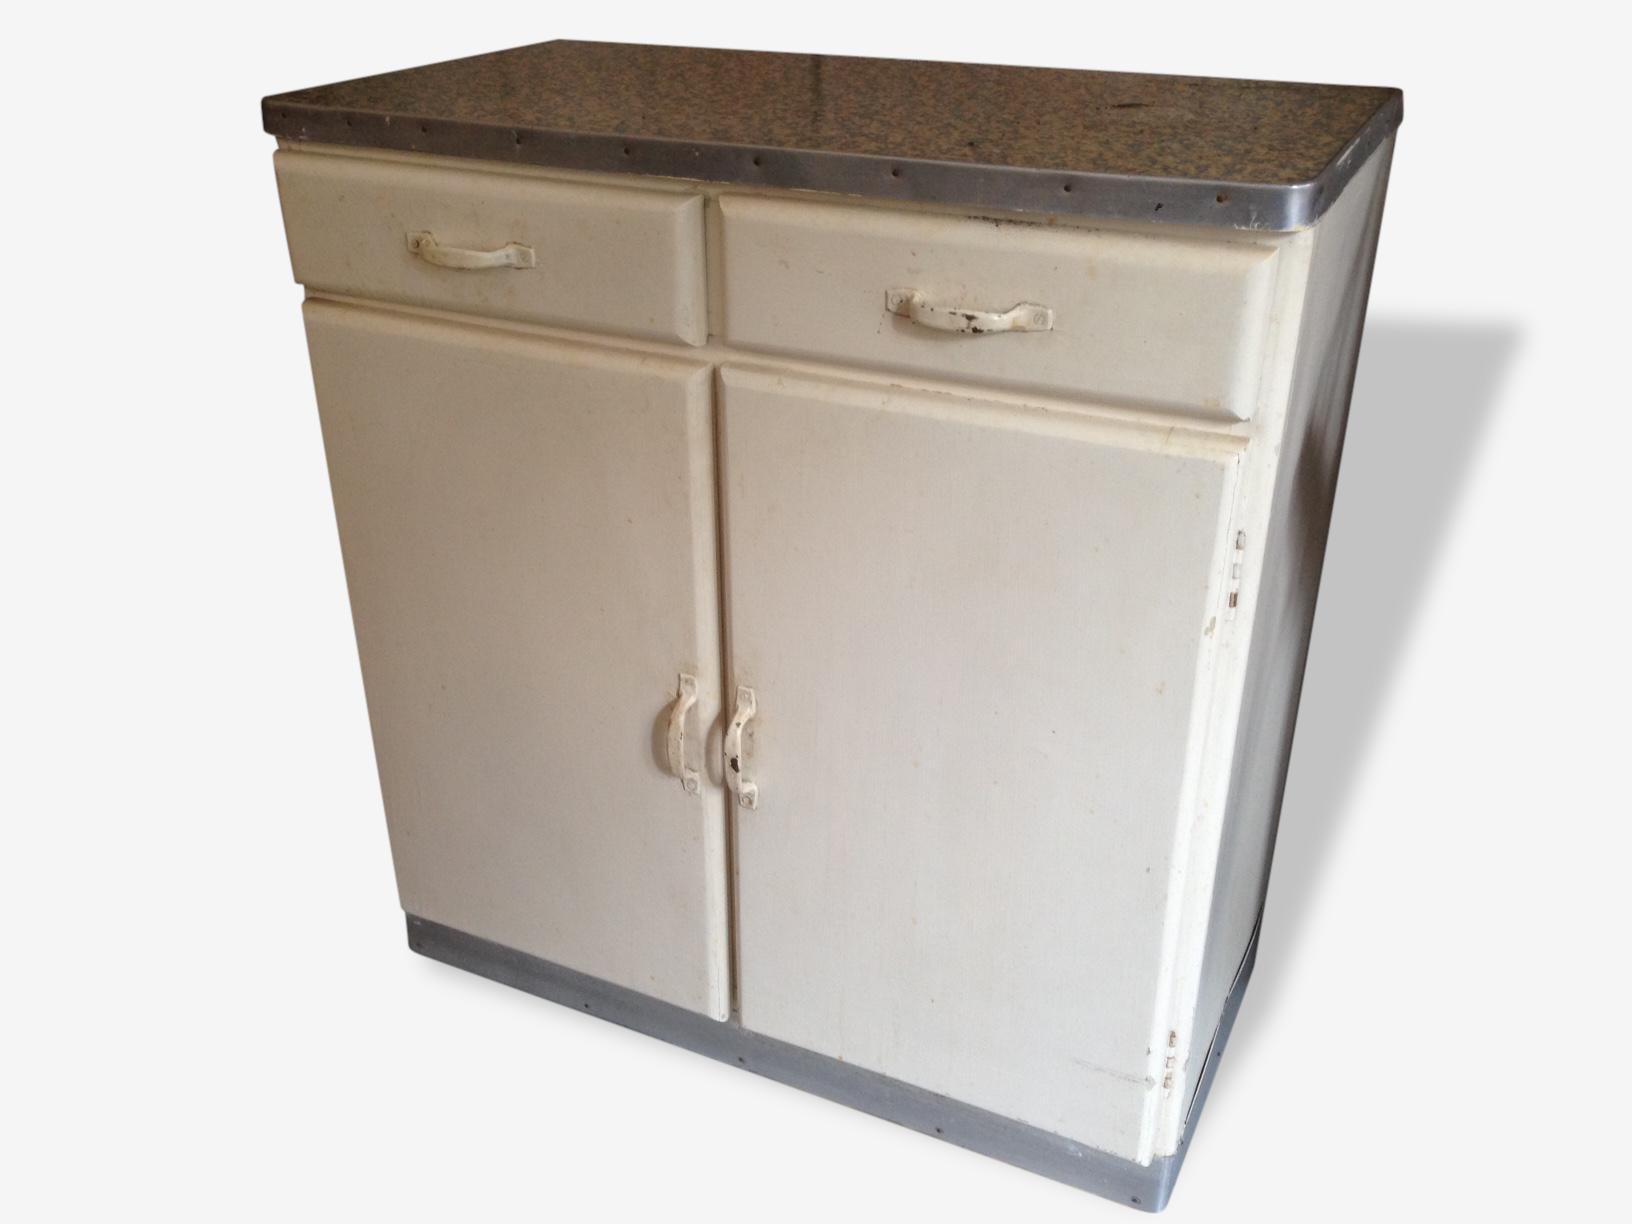 Meuble Mado petit meuble mado années 50 - bois (matériau) - beige - vintage - 137935